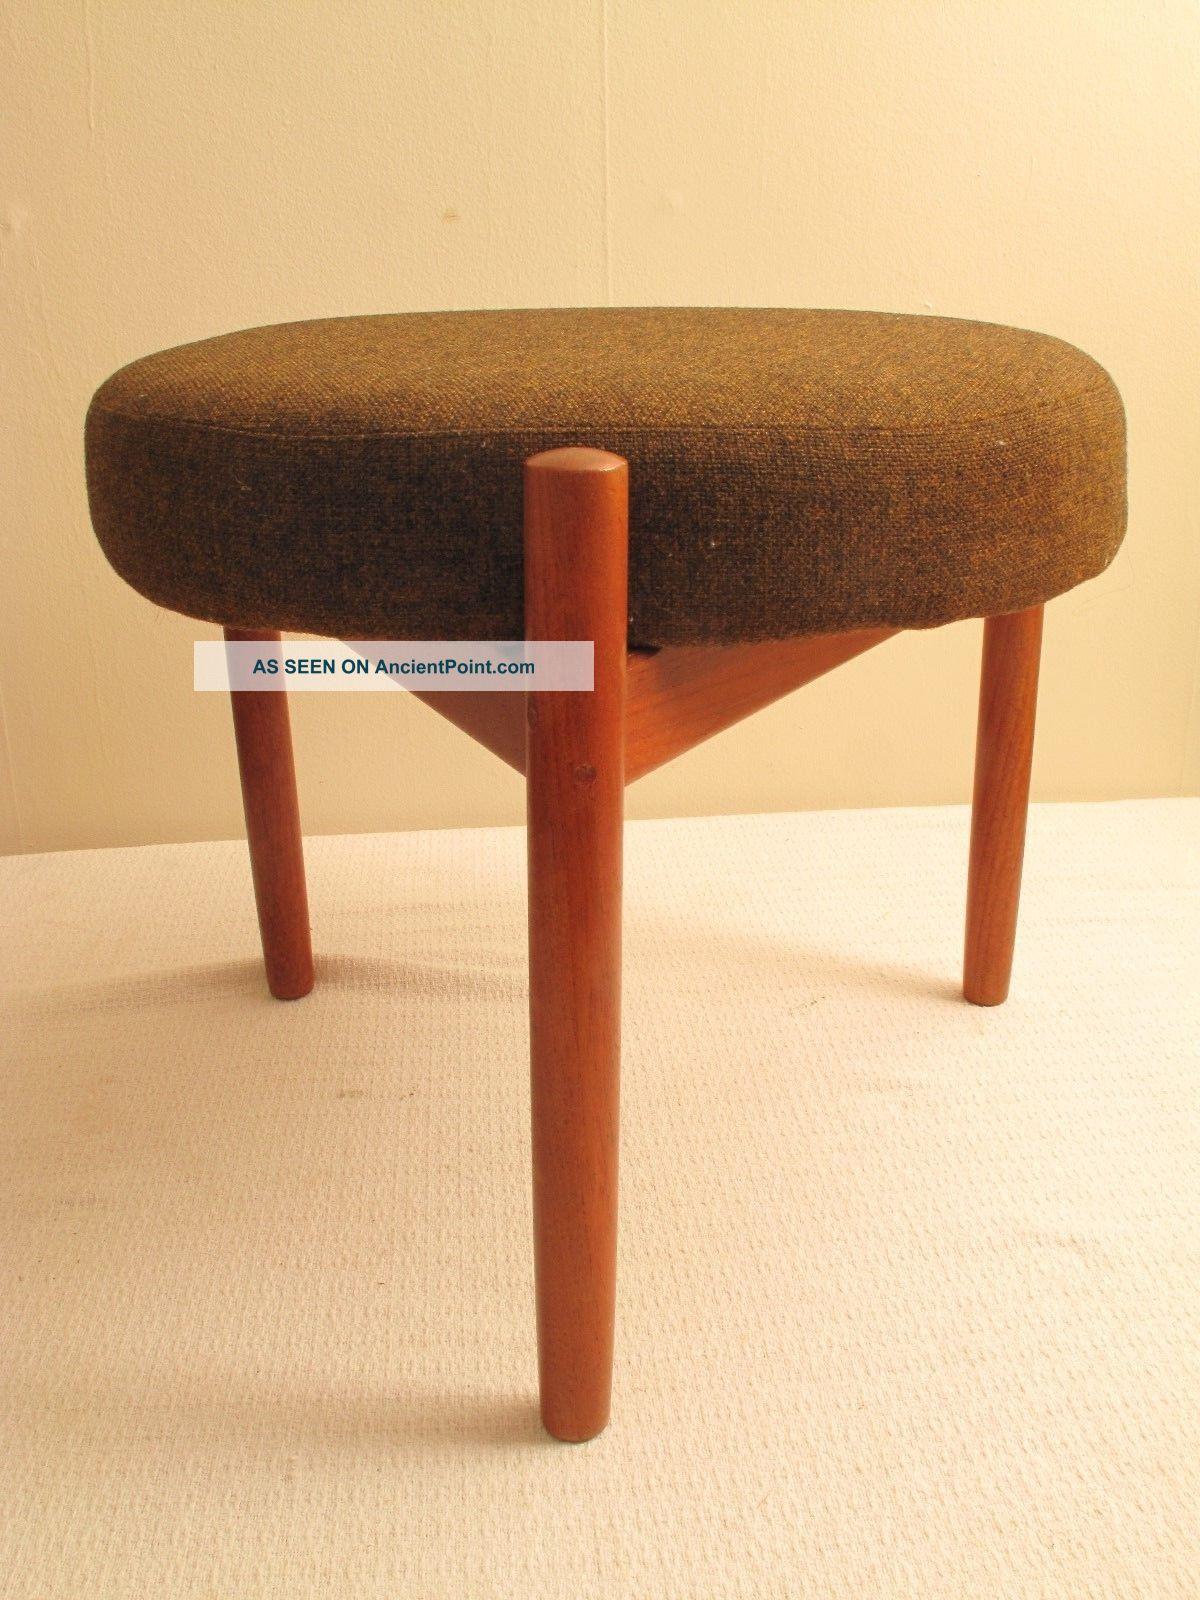 Image of: Vtg Mid Century Danish Modern Teak Foot Stool Ottoman Footstool Denmark Hundevad